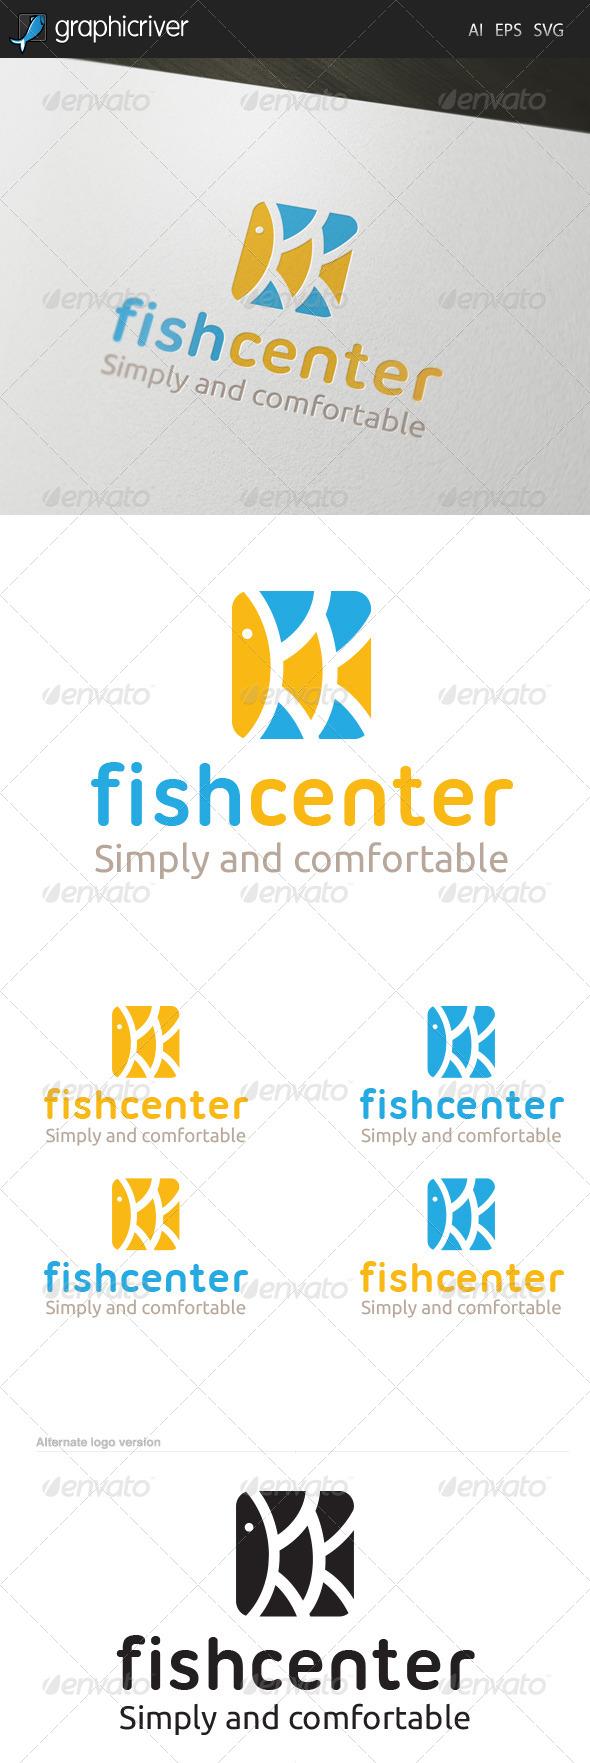 GraphicRiver Fish Center Logo 6590623